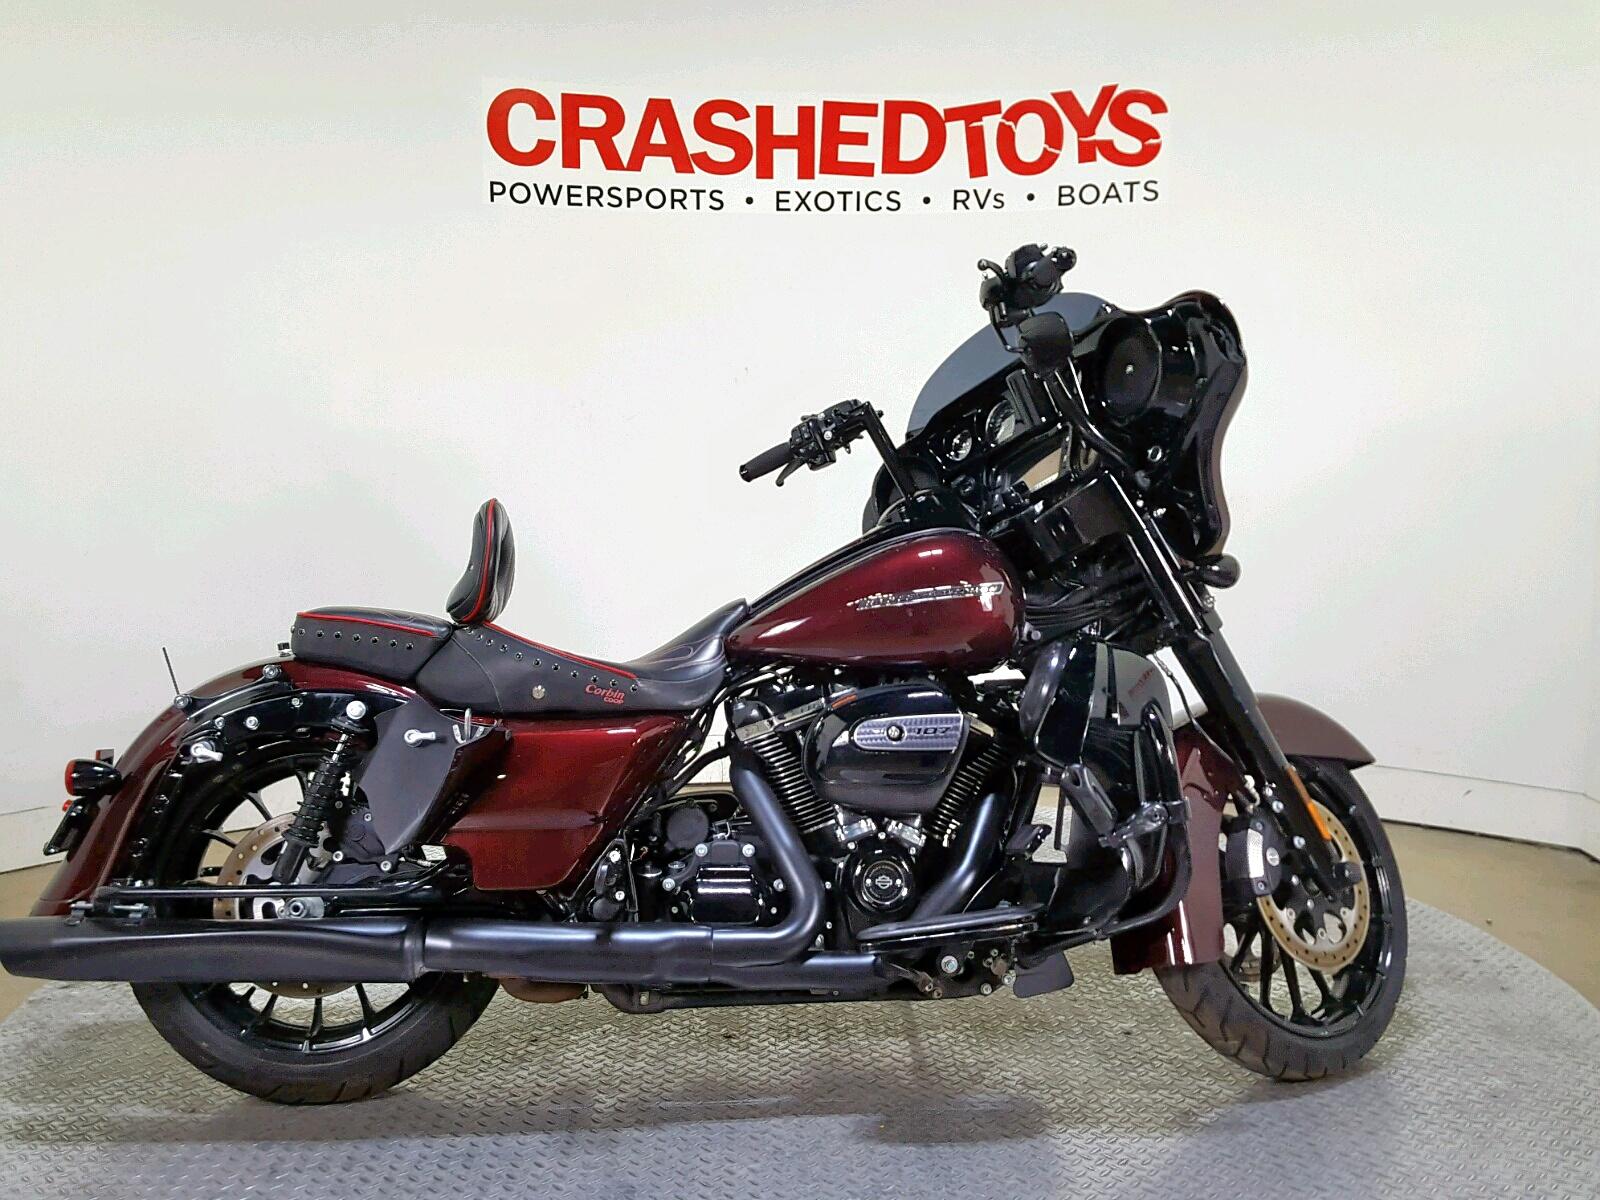 Salvage 2018 Harley-Davidson FLHXS STREET for sale